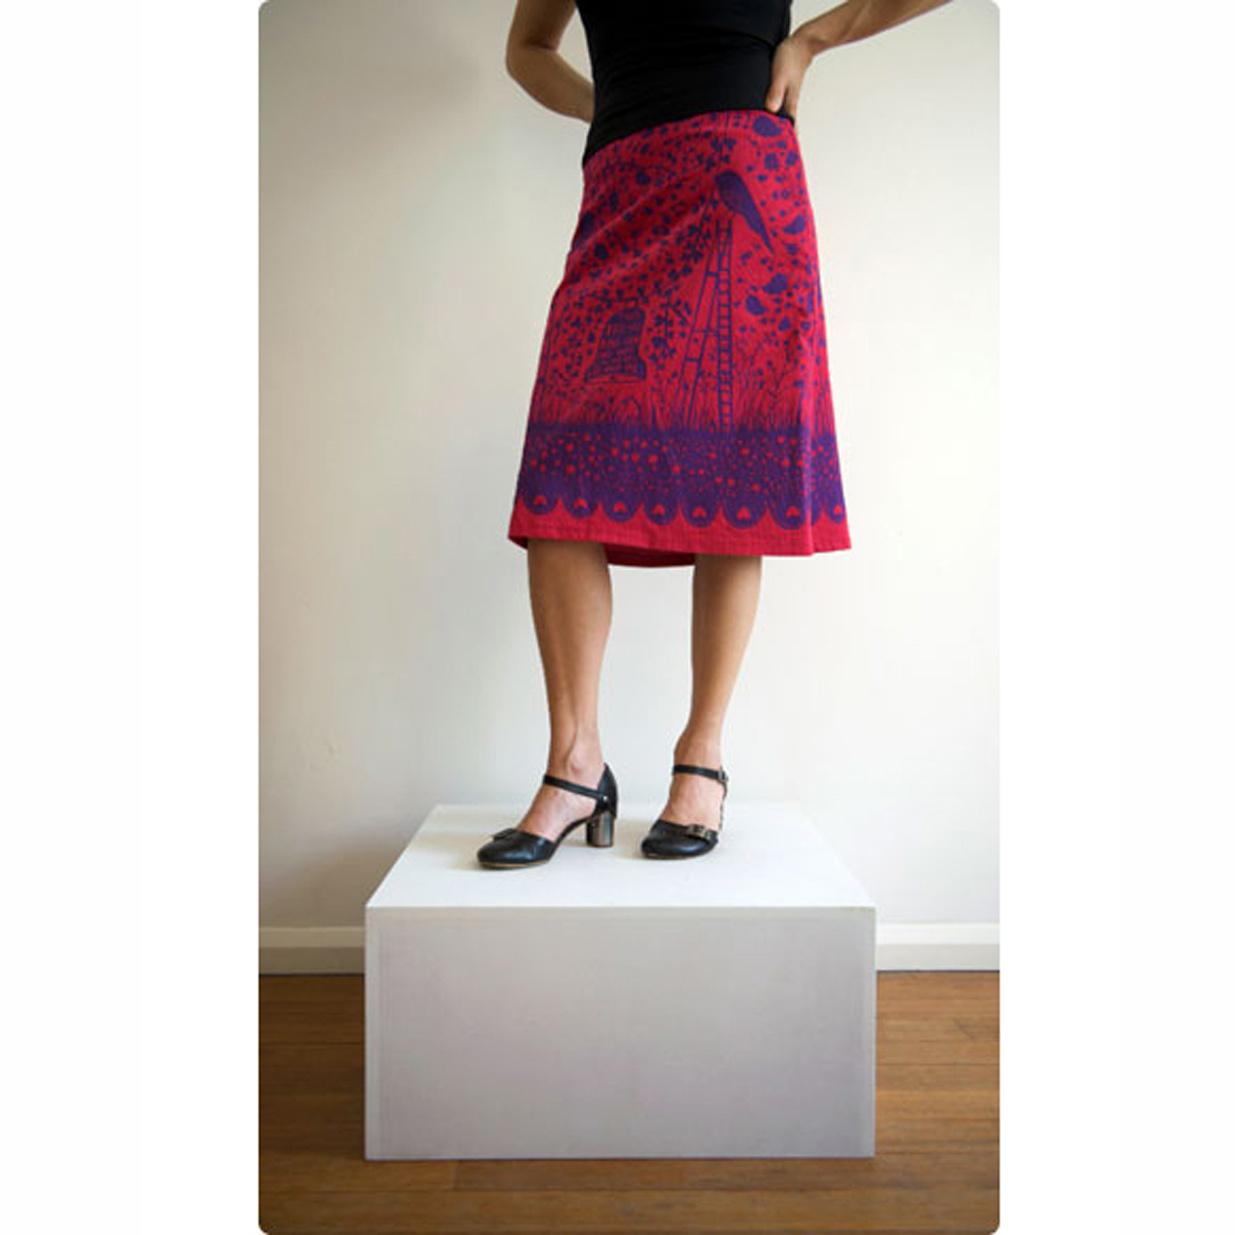 Clothkits DIY skirt Hold me Rob Ryan